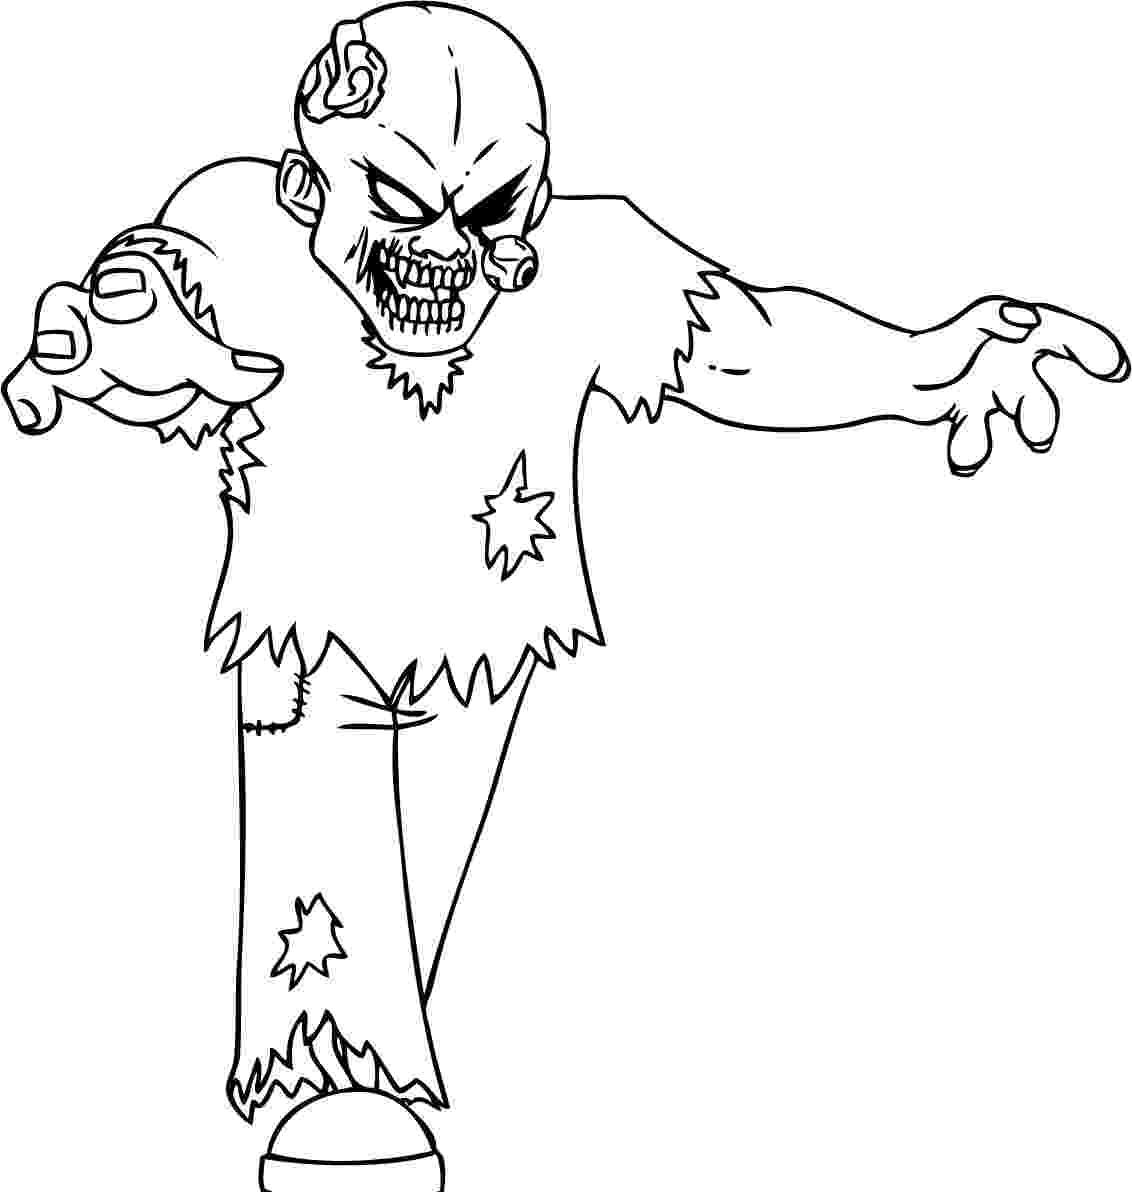 zombie printable coloring pages free printable zombies coloring pages for kids zombie coloring pages printable